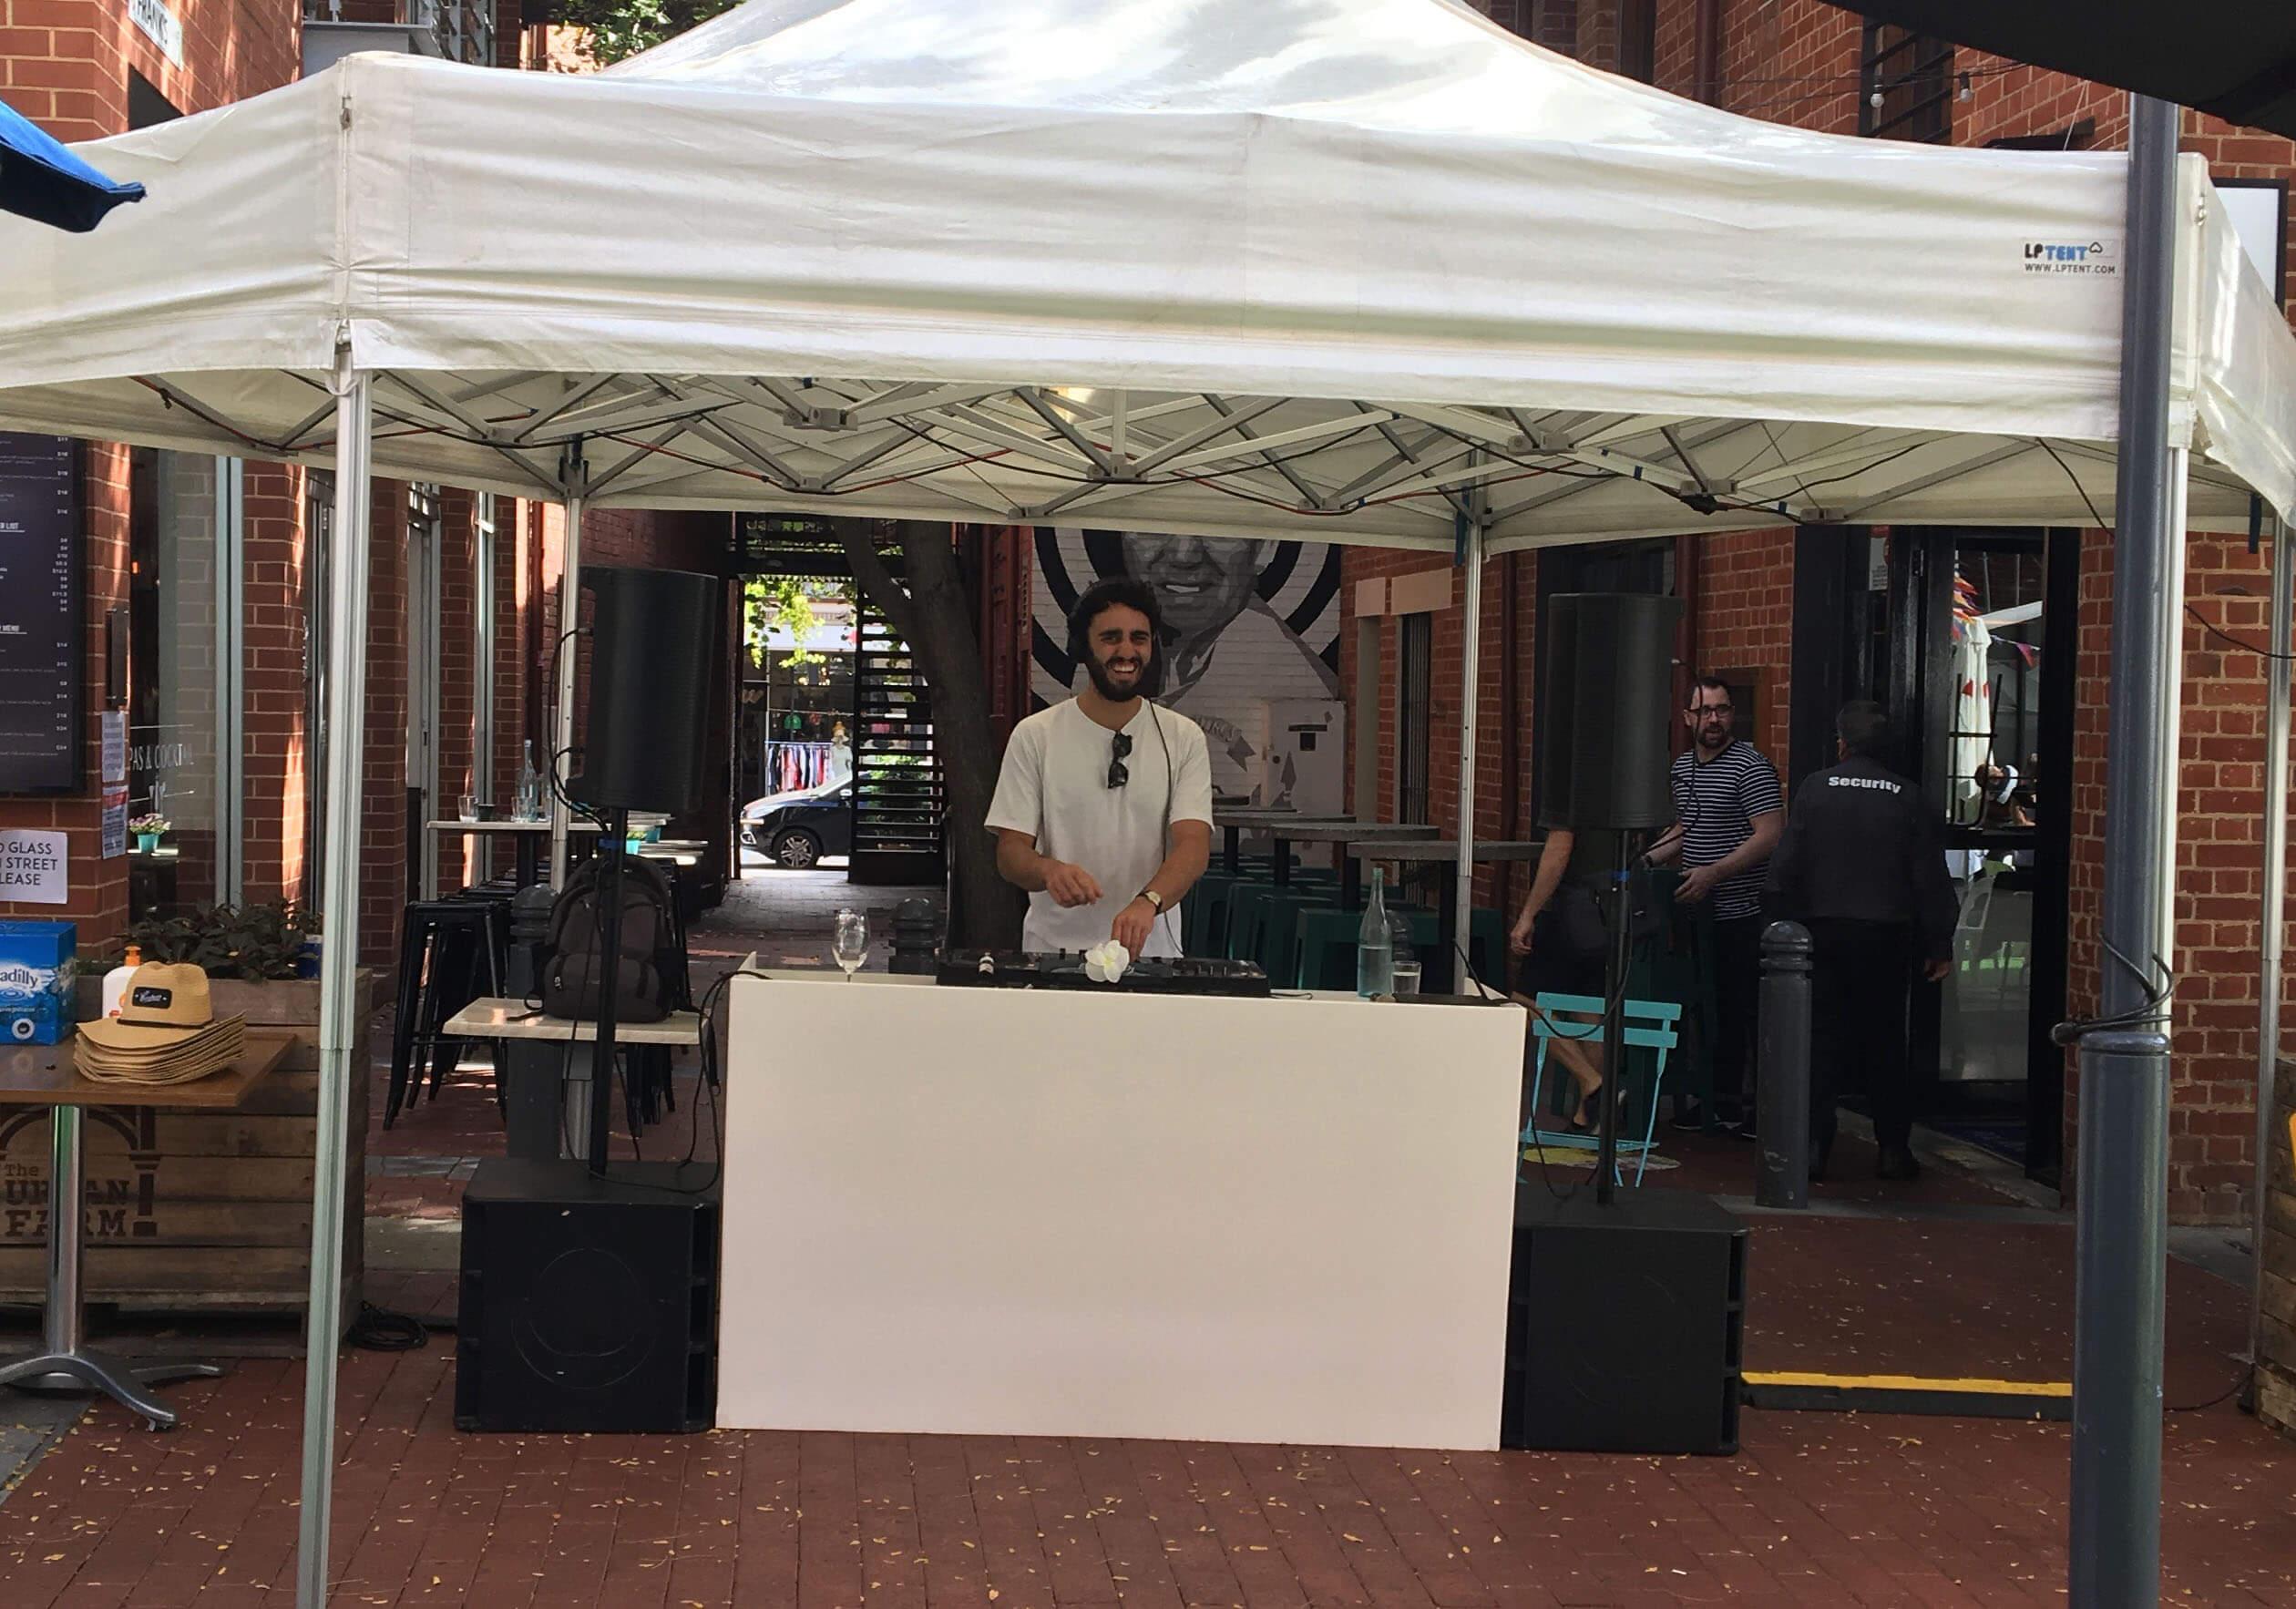 DJ Booth hire